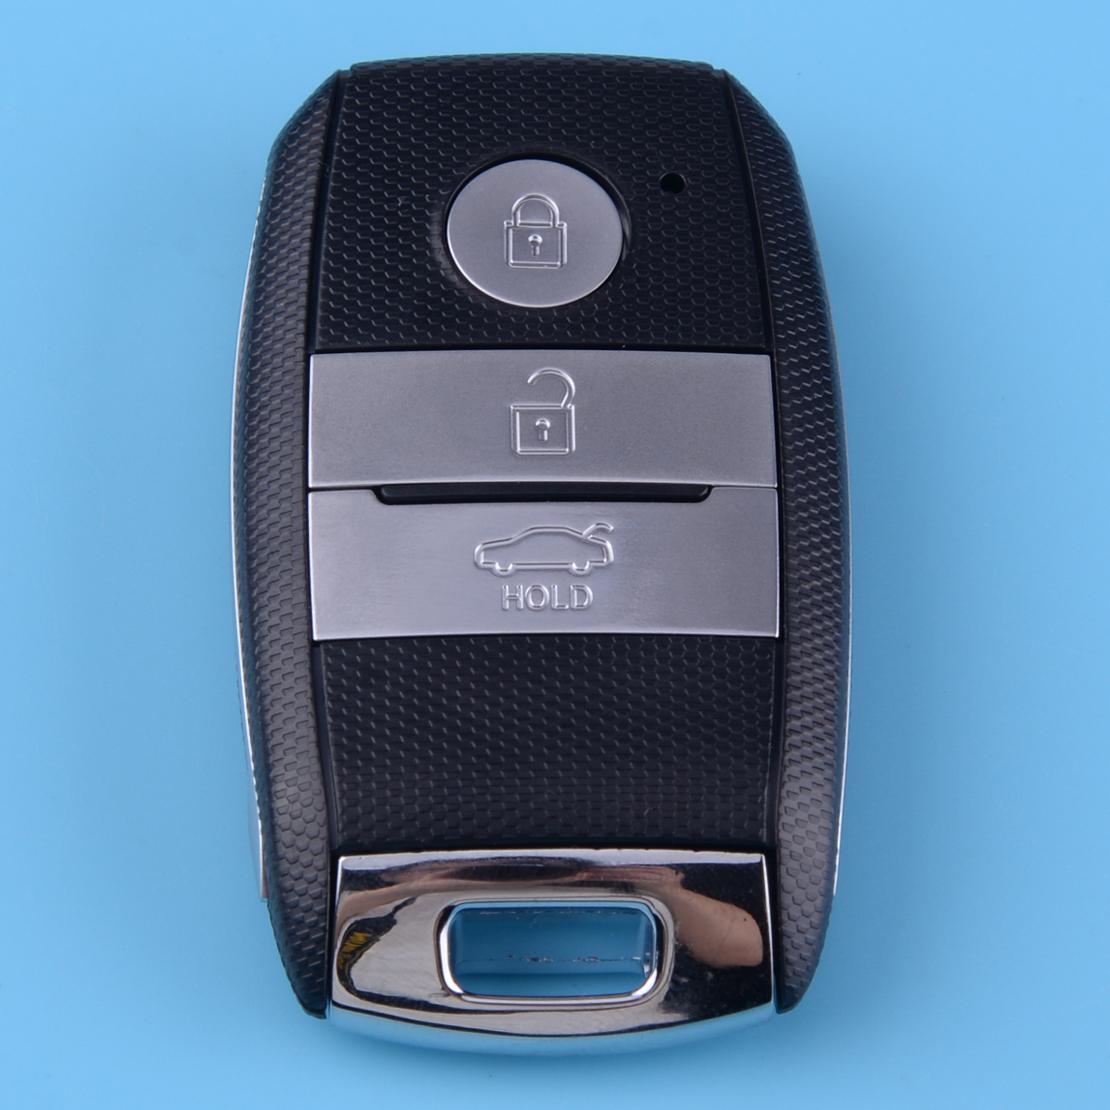 Smart Keyless Entry Remote key Fob 3 BTN for Kia Sportage Sorento 433MHz ID46